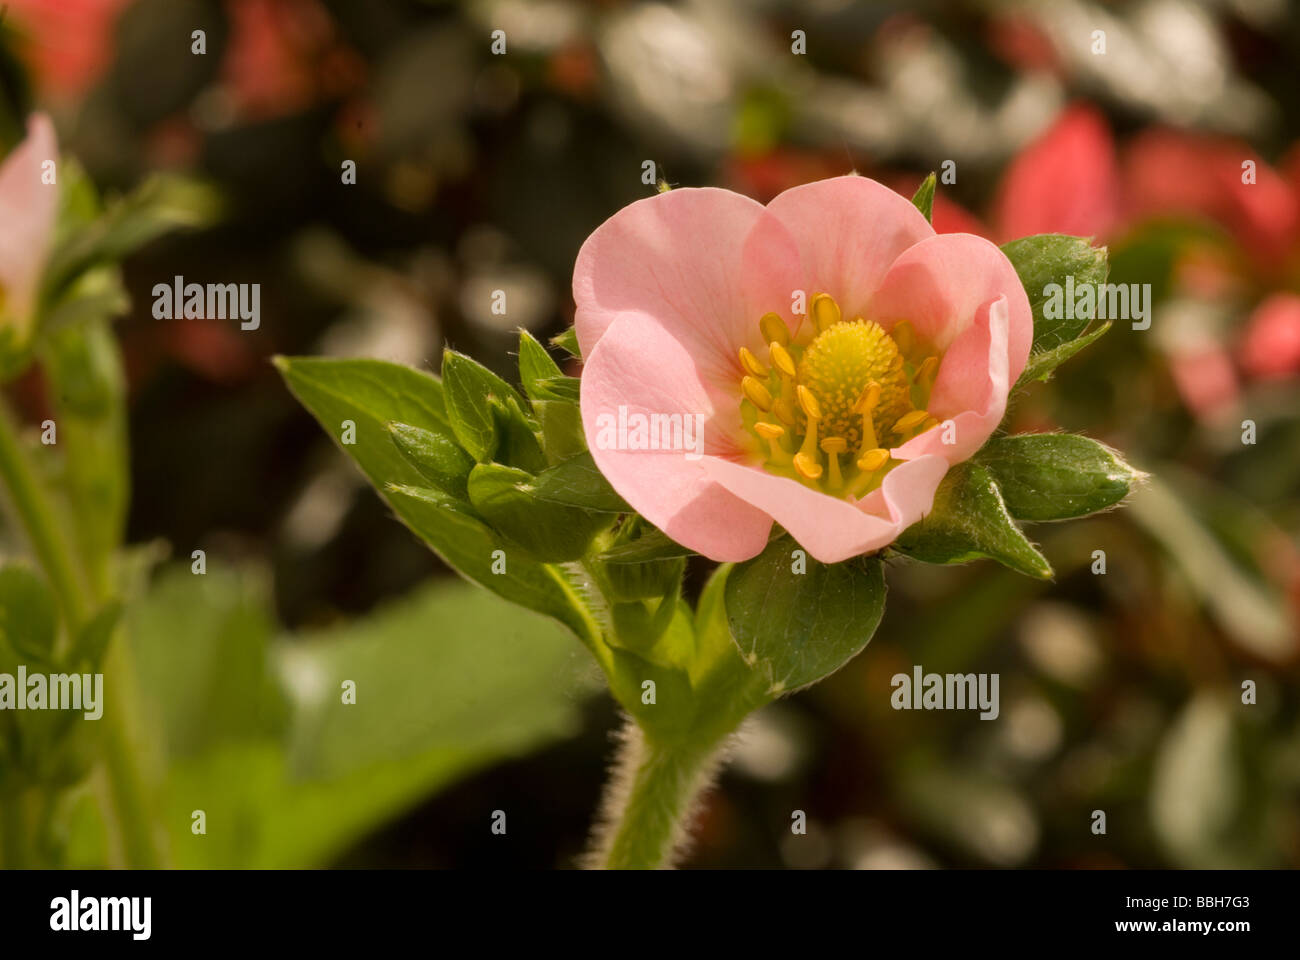 Strawberries Fragaria sp., fragola, Rosaceae - Stock Image